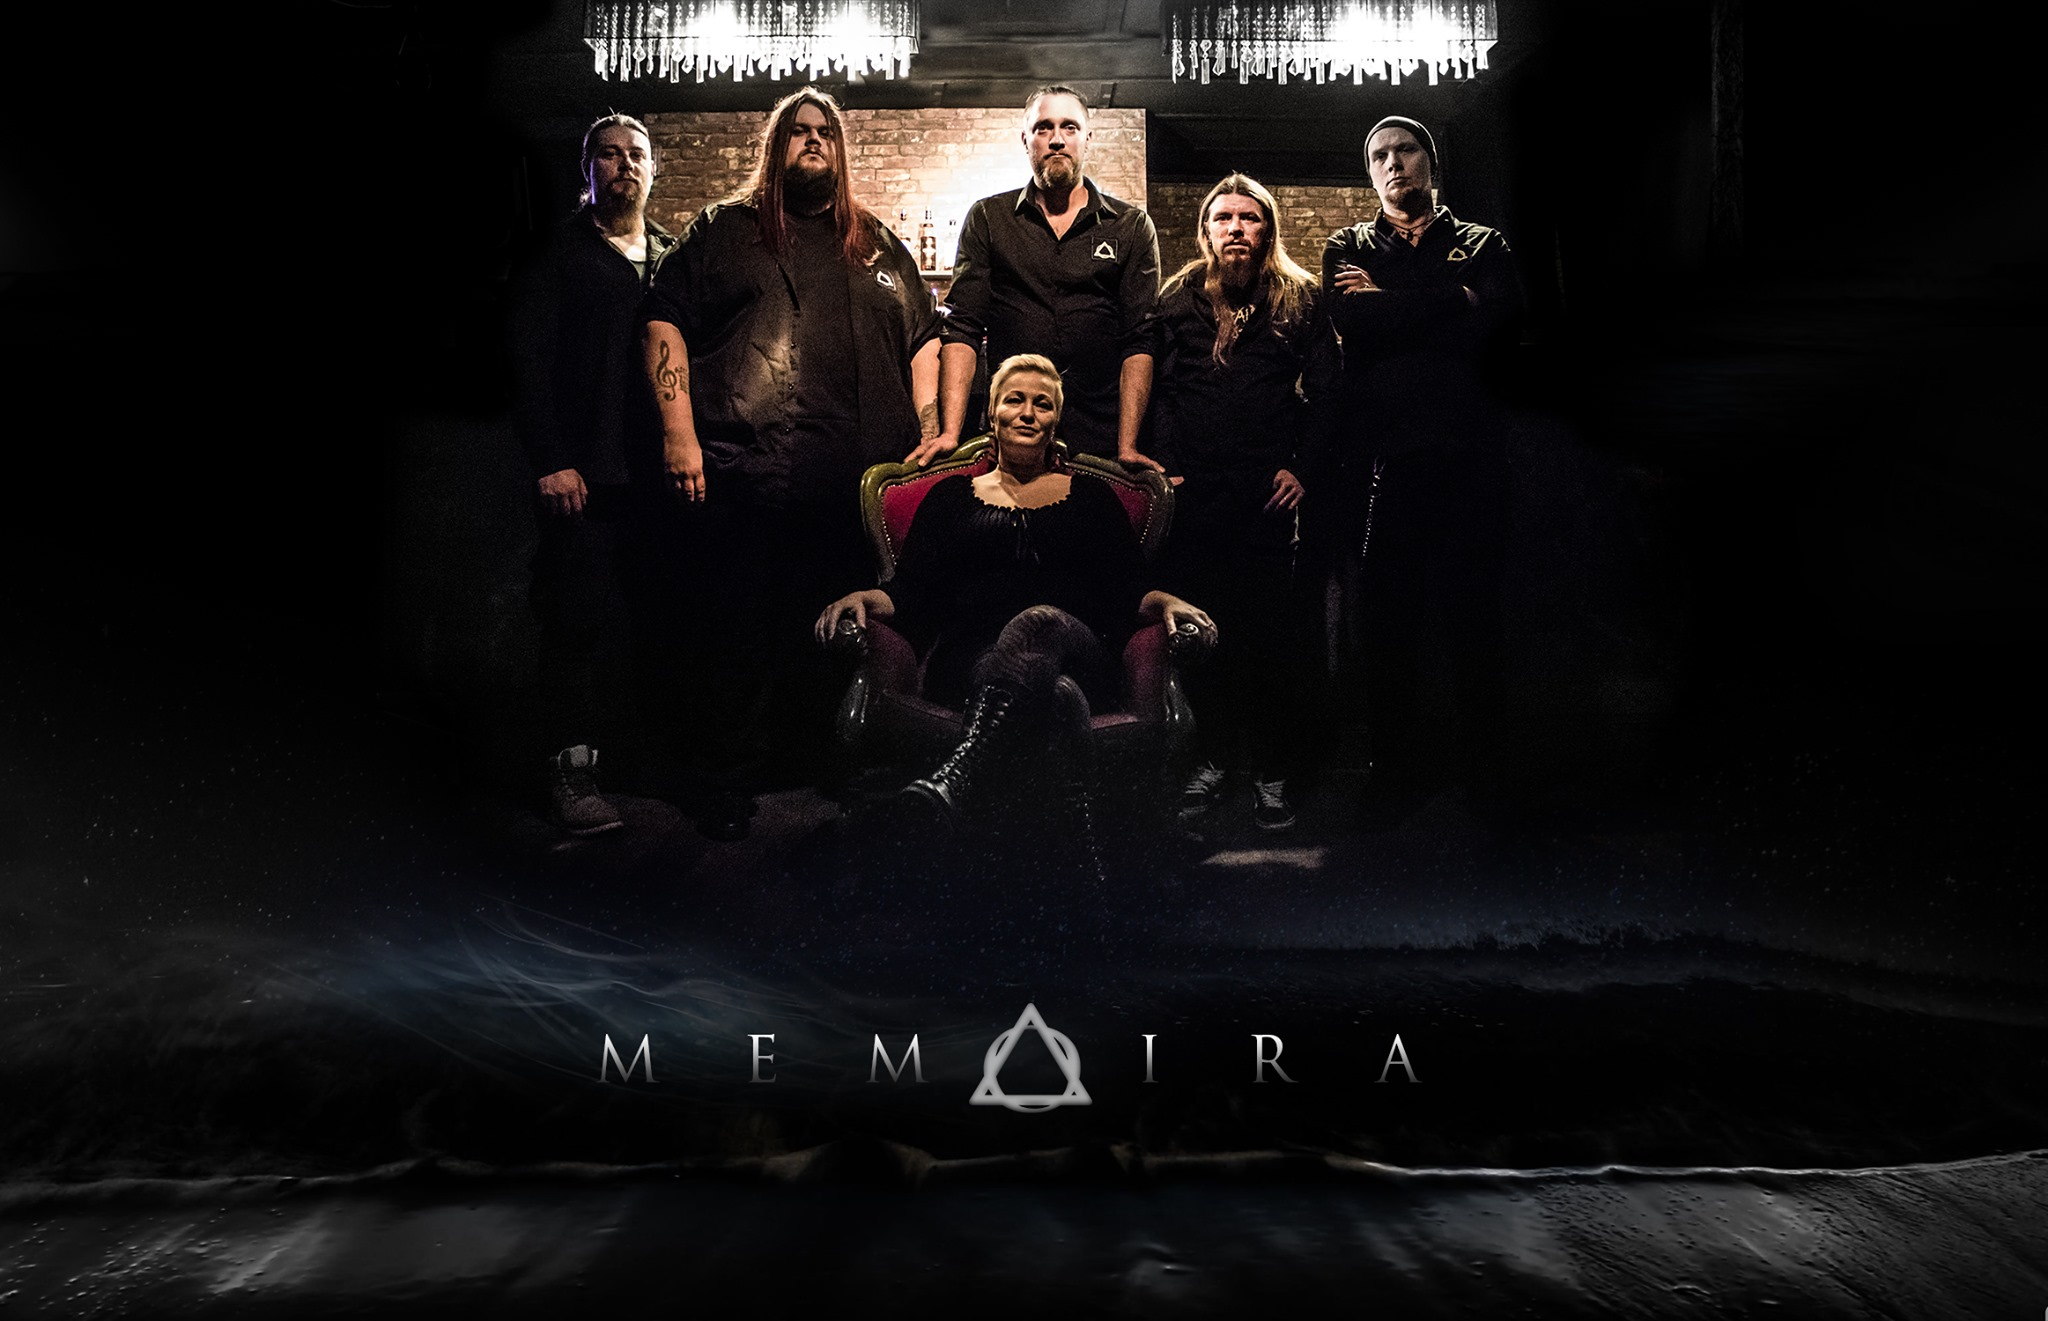 Memoira (Finlandia) presenta videoclip «Carnival Of Creation», adelanto de tercer álbum